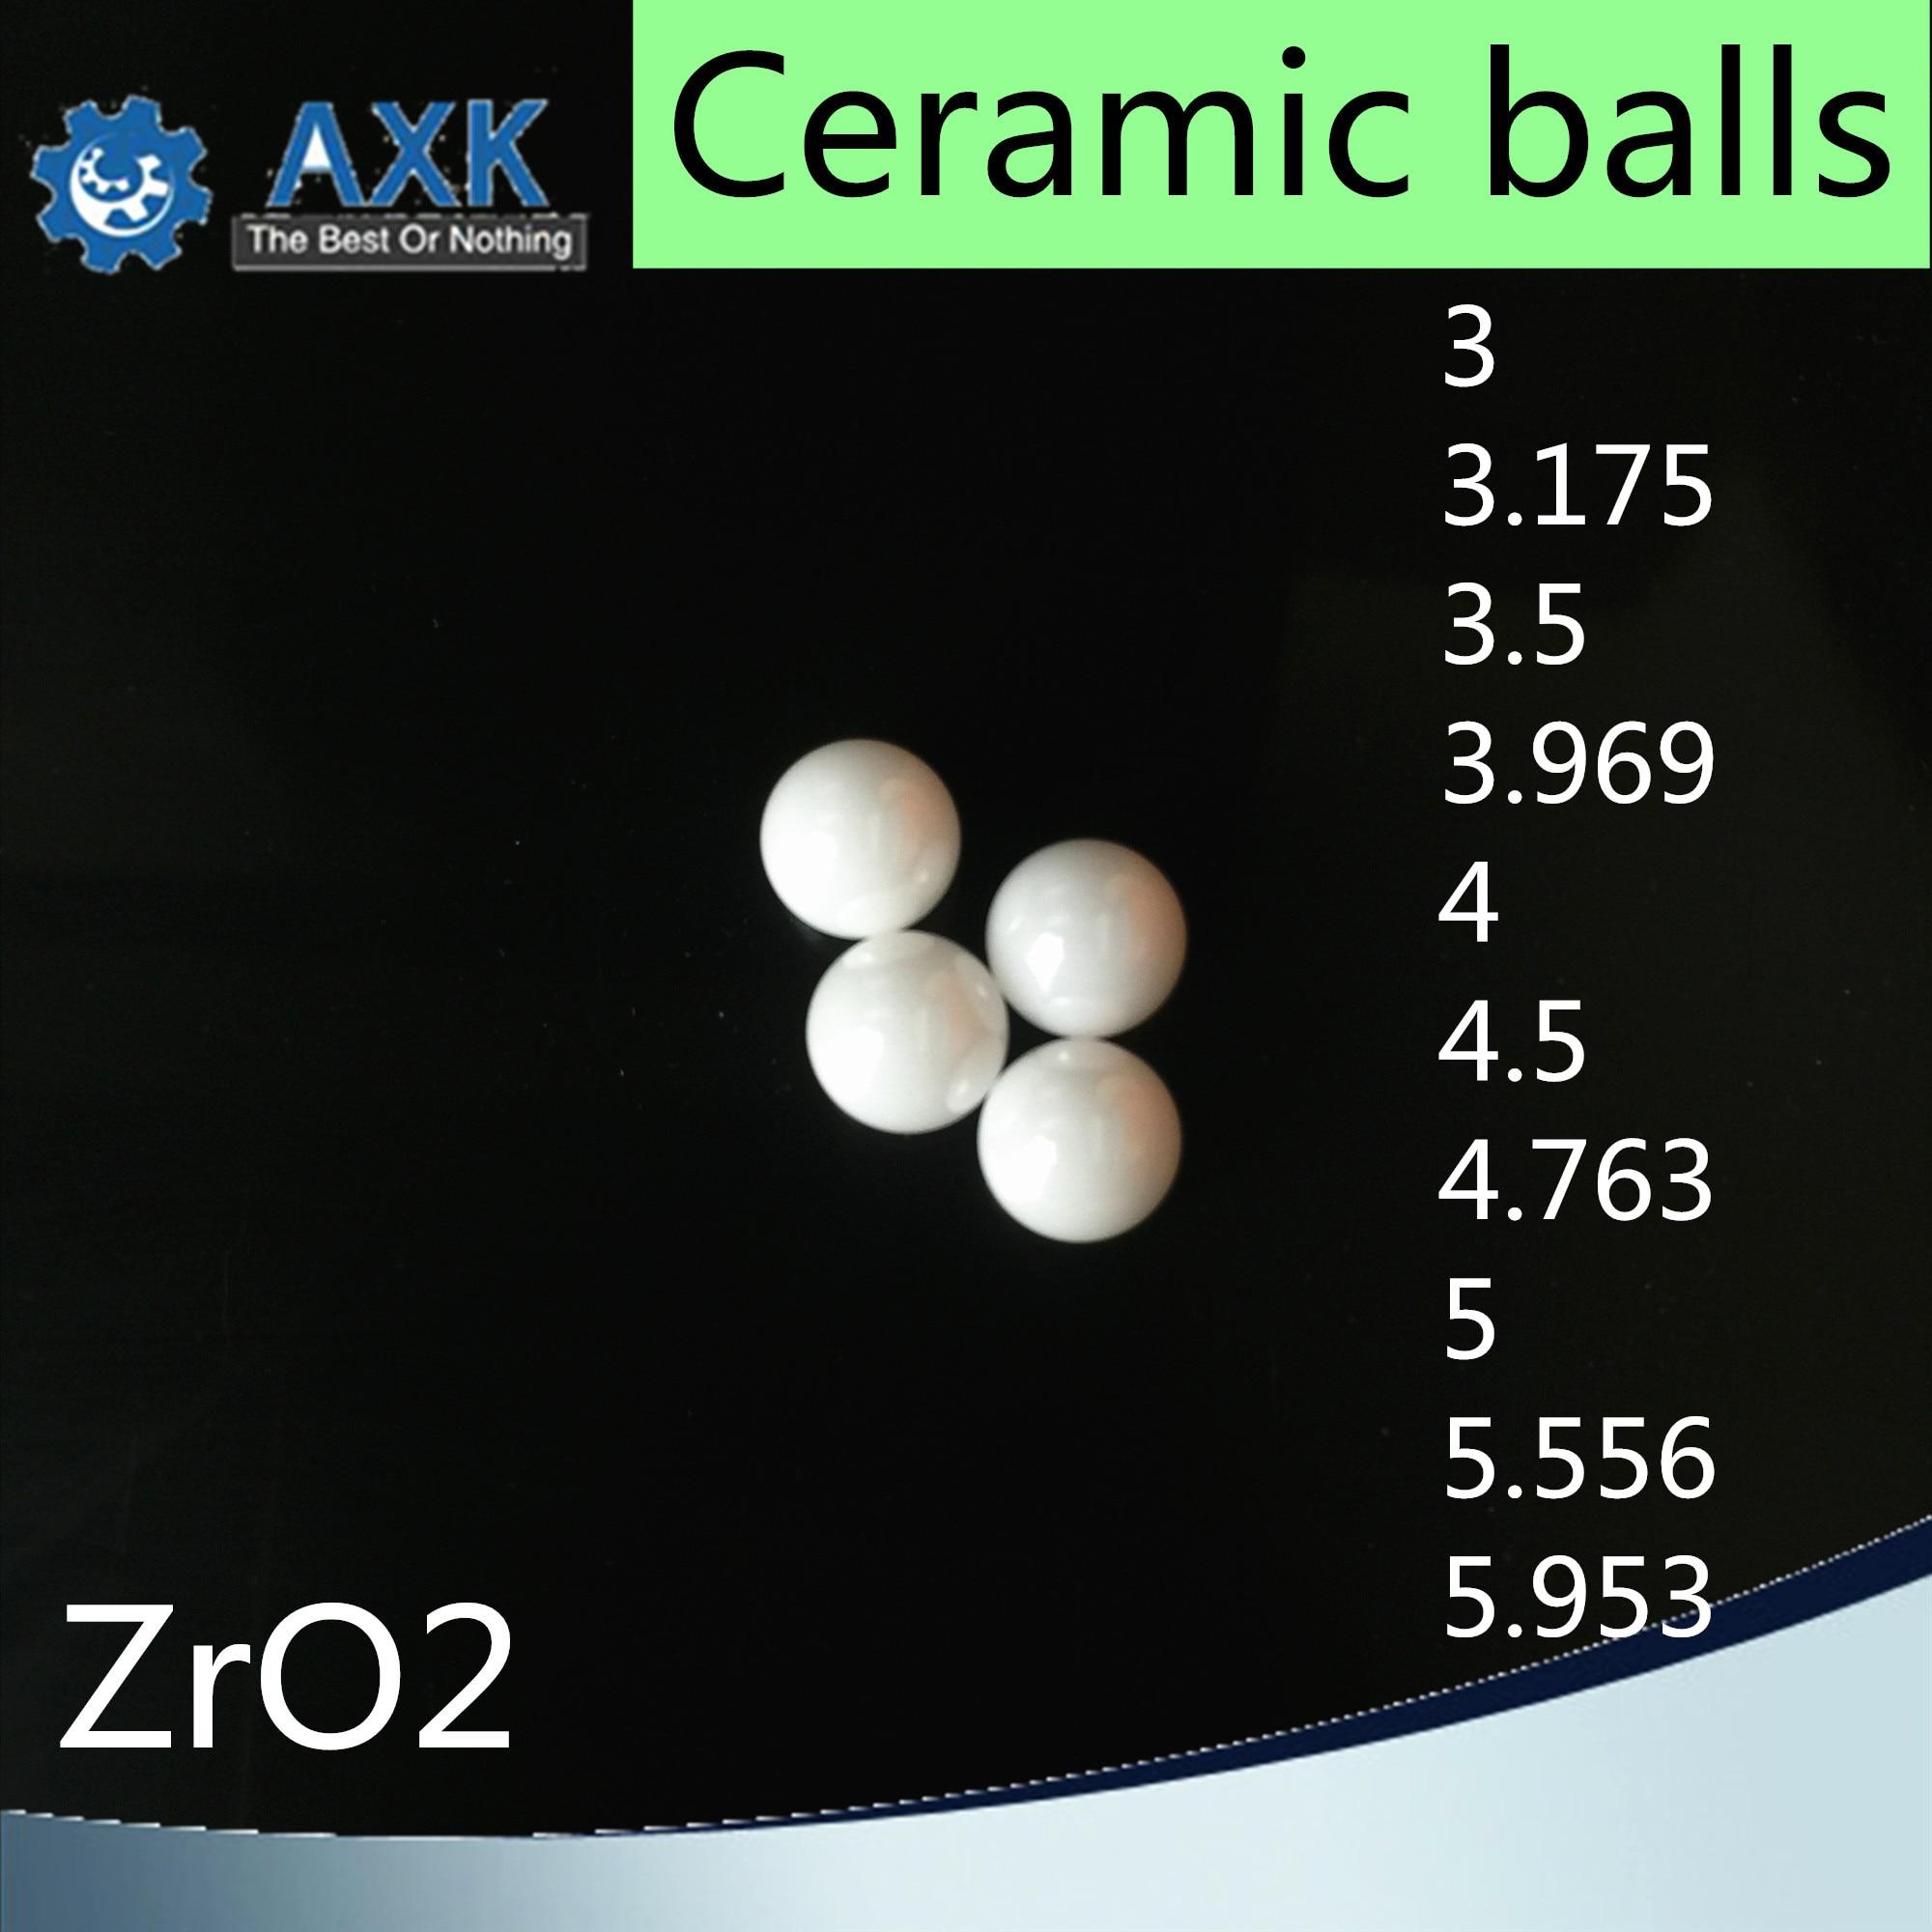 ZrO2 kule ceramiczne 3 3.175 3.5 3.969 4 4.5 4.763 5 5.556 5.953 ( 10 PC) na bazie dwutlenku cyrkonu G5 kulkowe